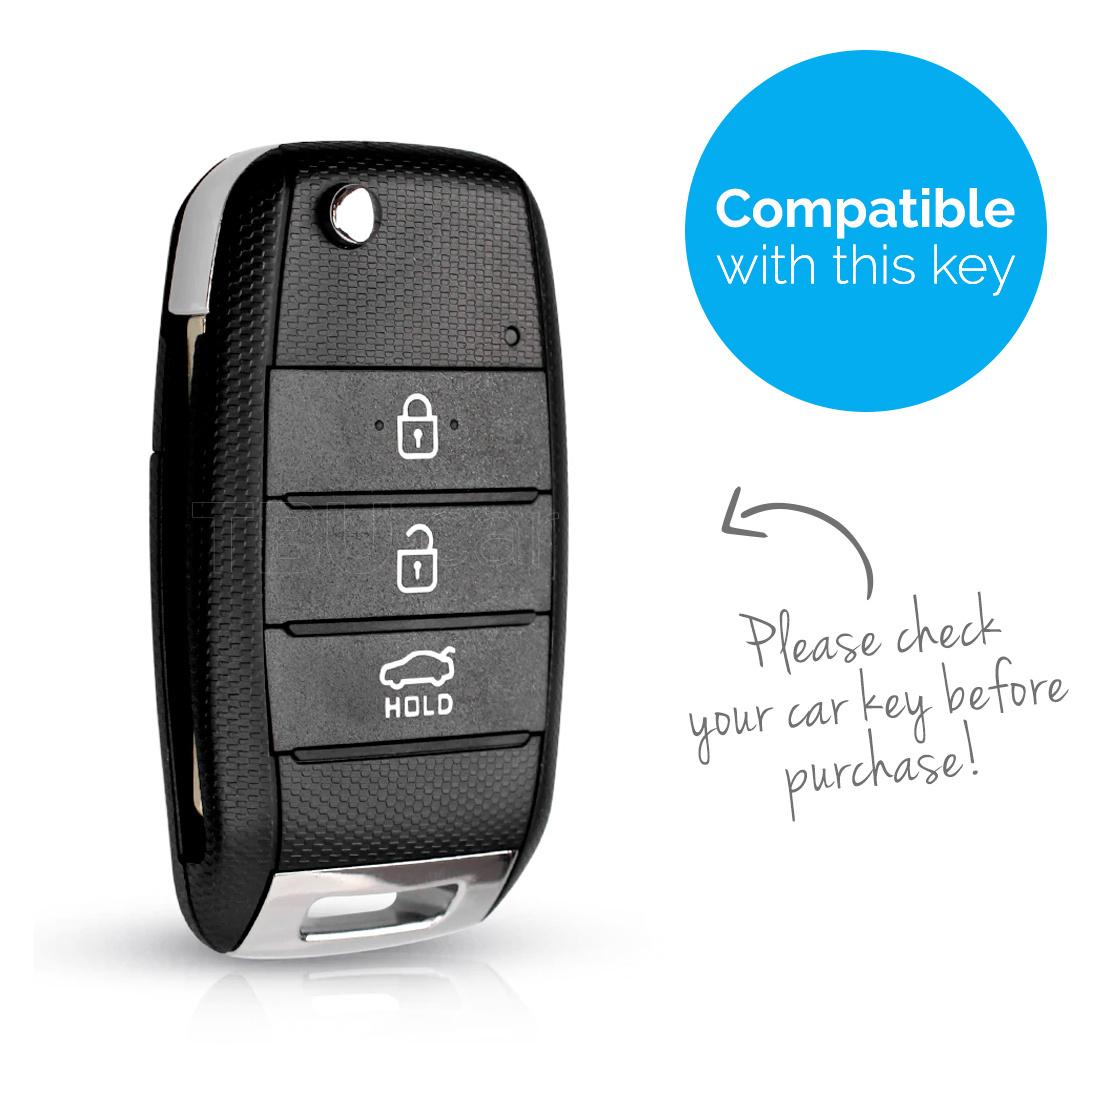 TBU car TBU car Autoschlüssel Hülle kompatibel mit Hyundai 3 Tasten - Schutzhülle aus Silikon - Auto Schlüsselhülle Cover in Blau